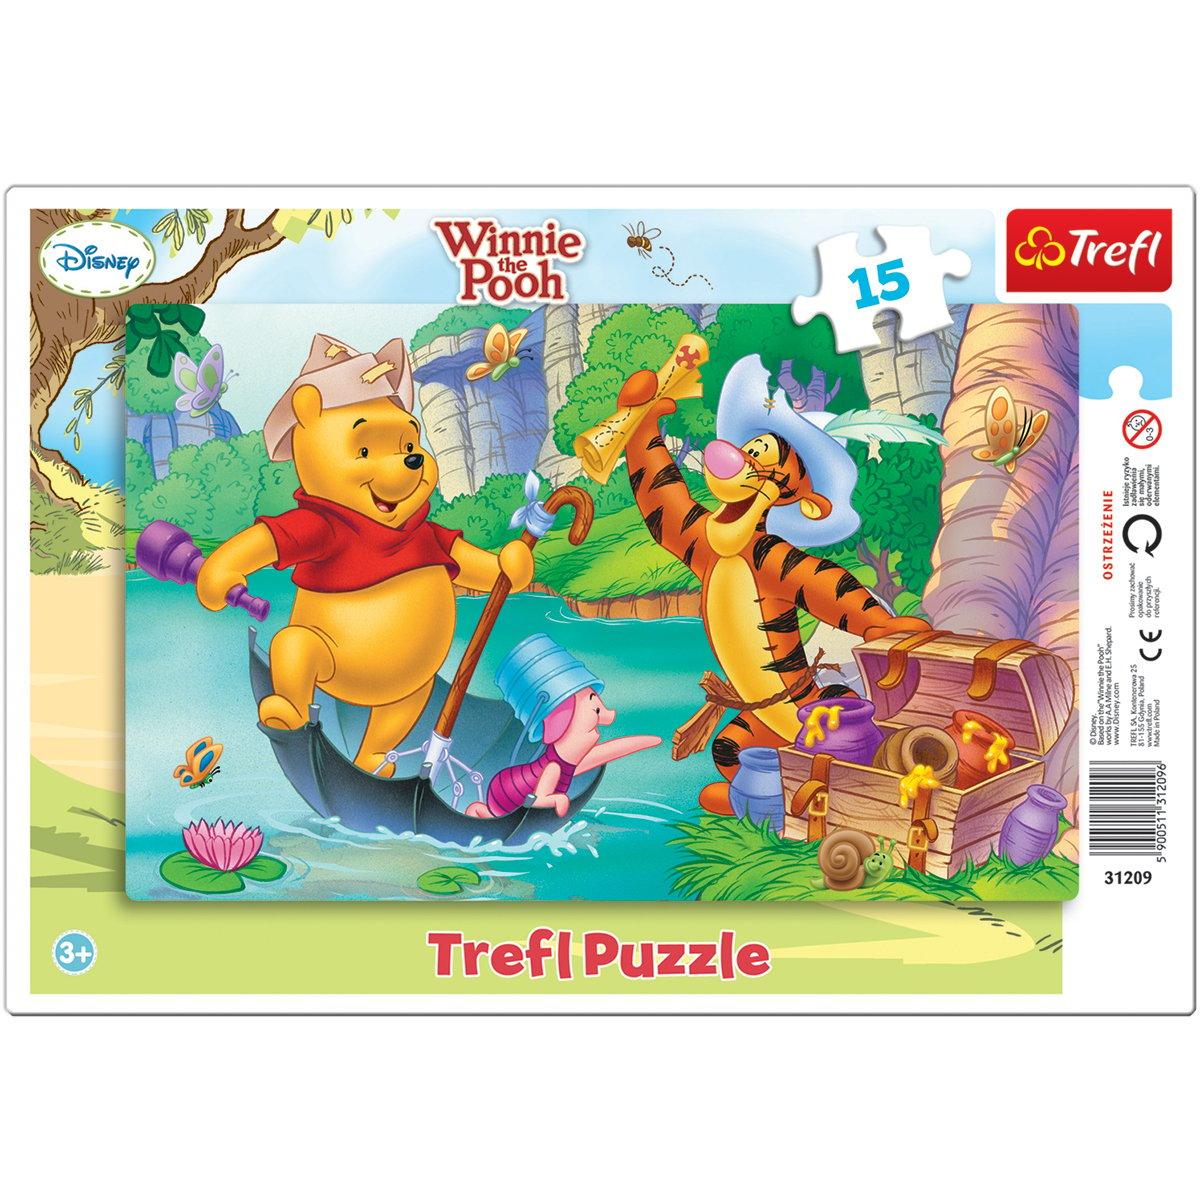 Puzzle Trefl 15 piese in rama, Vanatoarea de comori, Winnie the Pooh